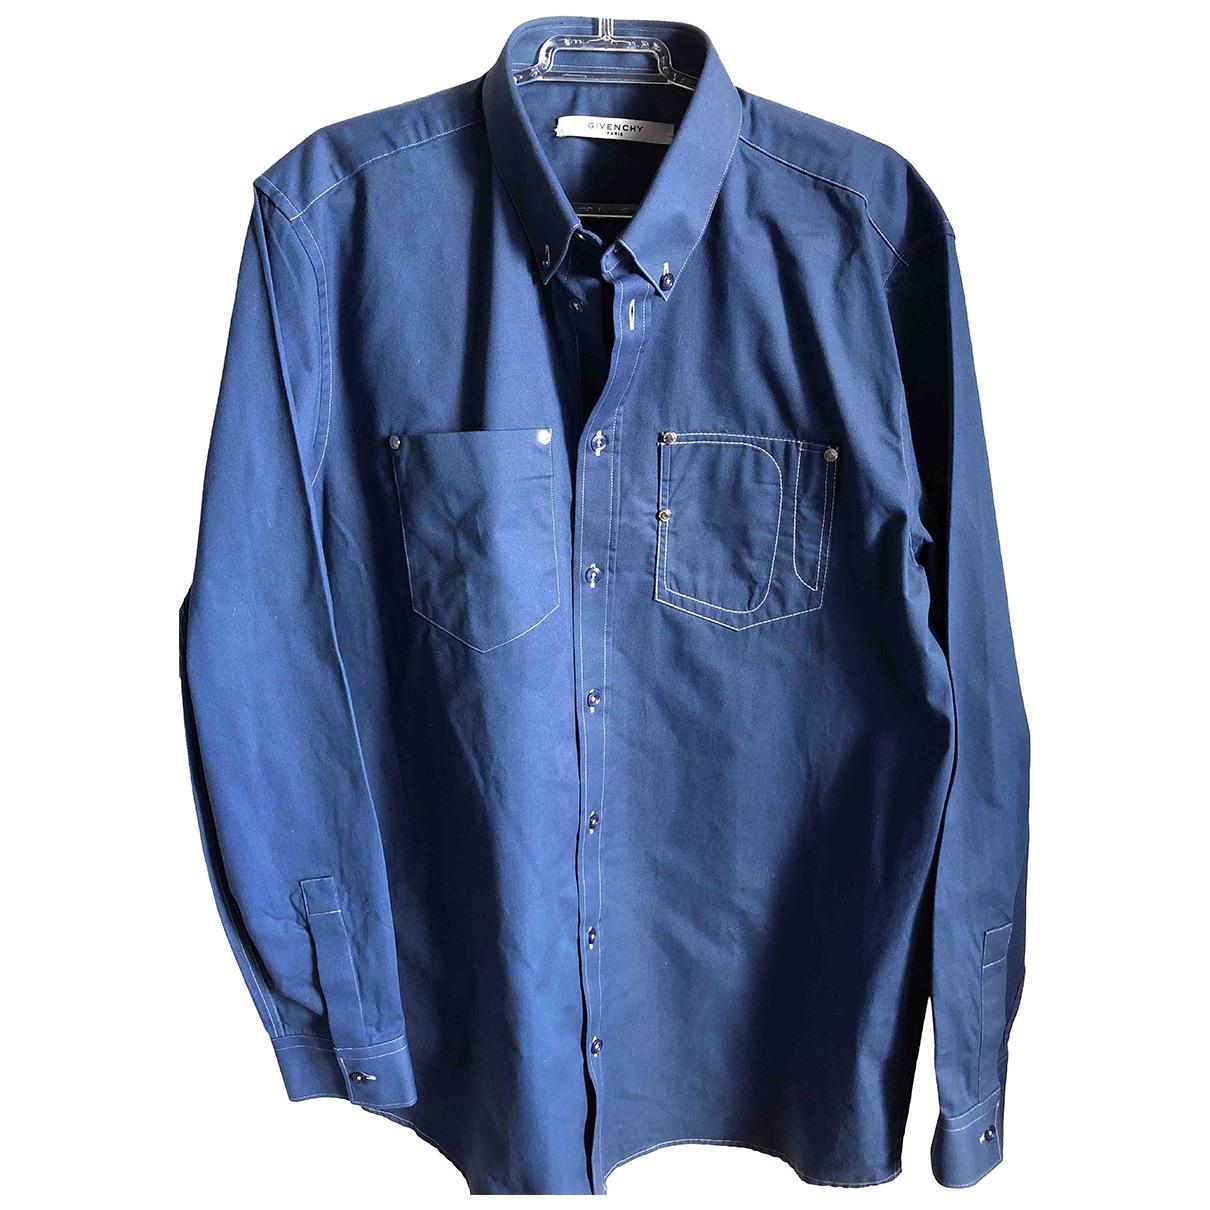 Givenchy \N Blue Cotton Shirts for Men 39 EU (tour de cou / collar)